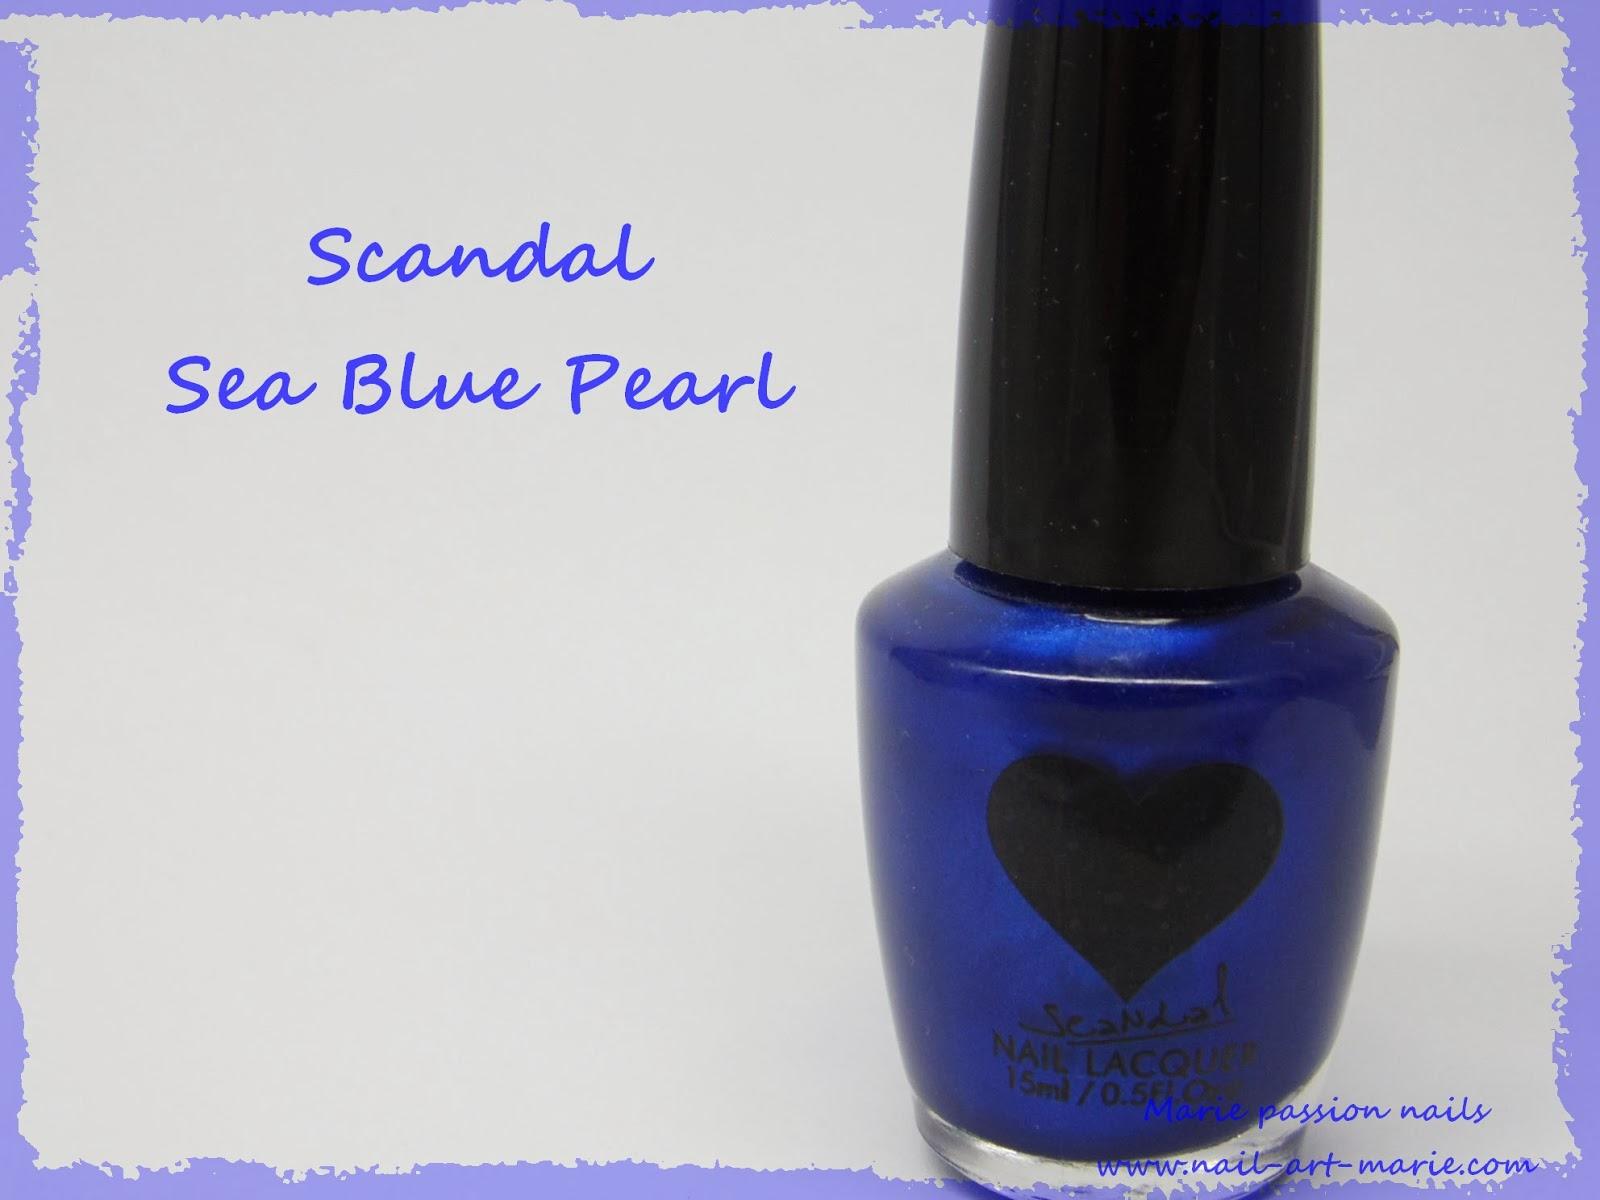 Vernis Scandal Sea Blue Pearl1